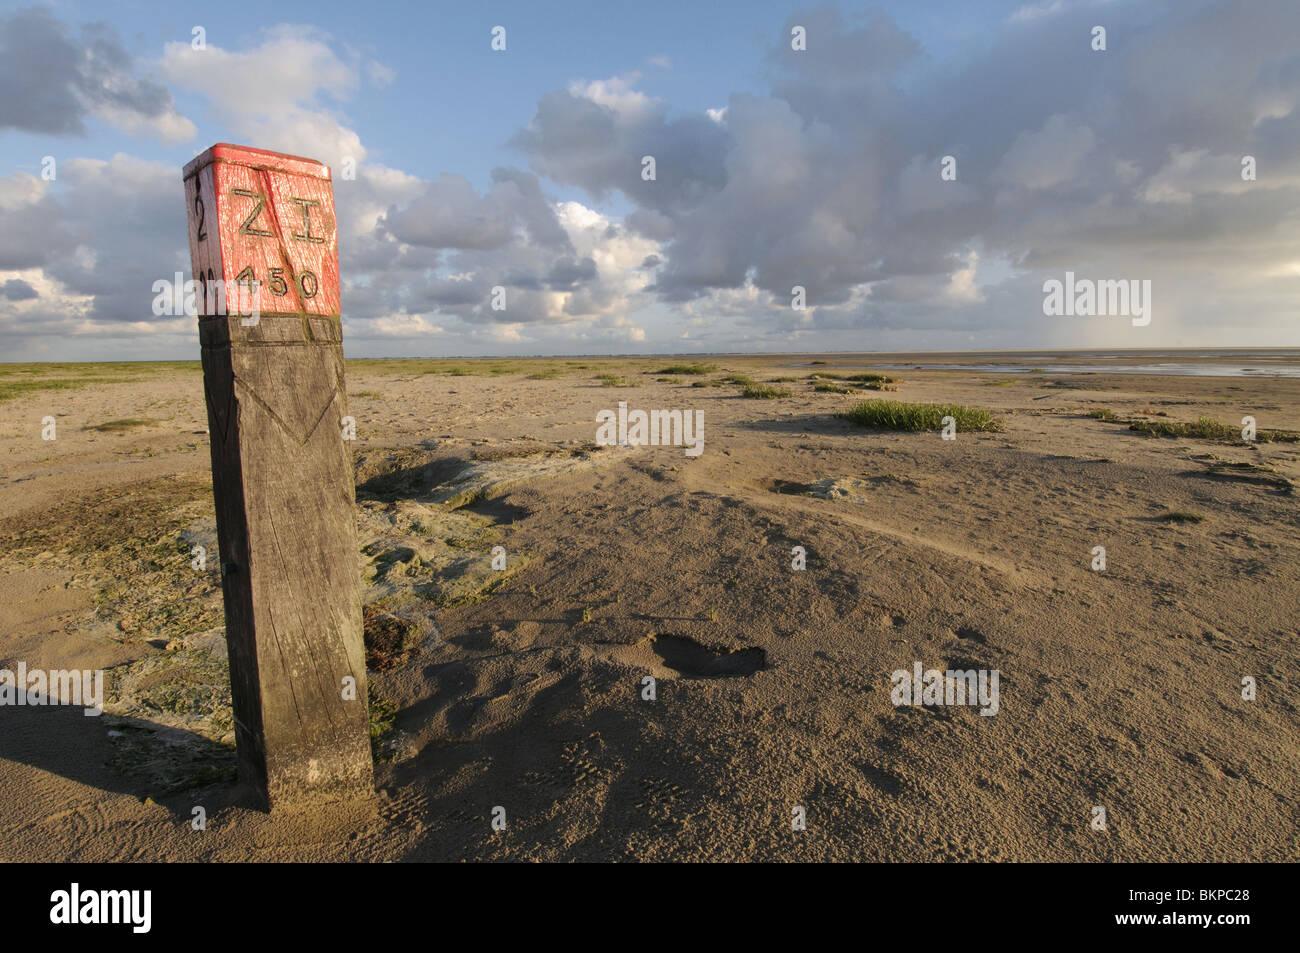 Strandpaal op grote, open en verlaten strandvlakte; Wooden pole on deserted beach Stock Photo